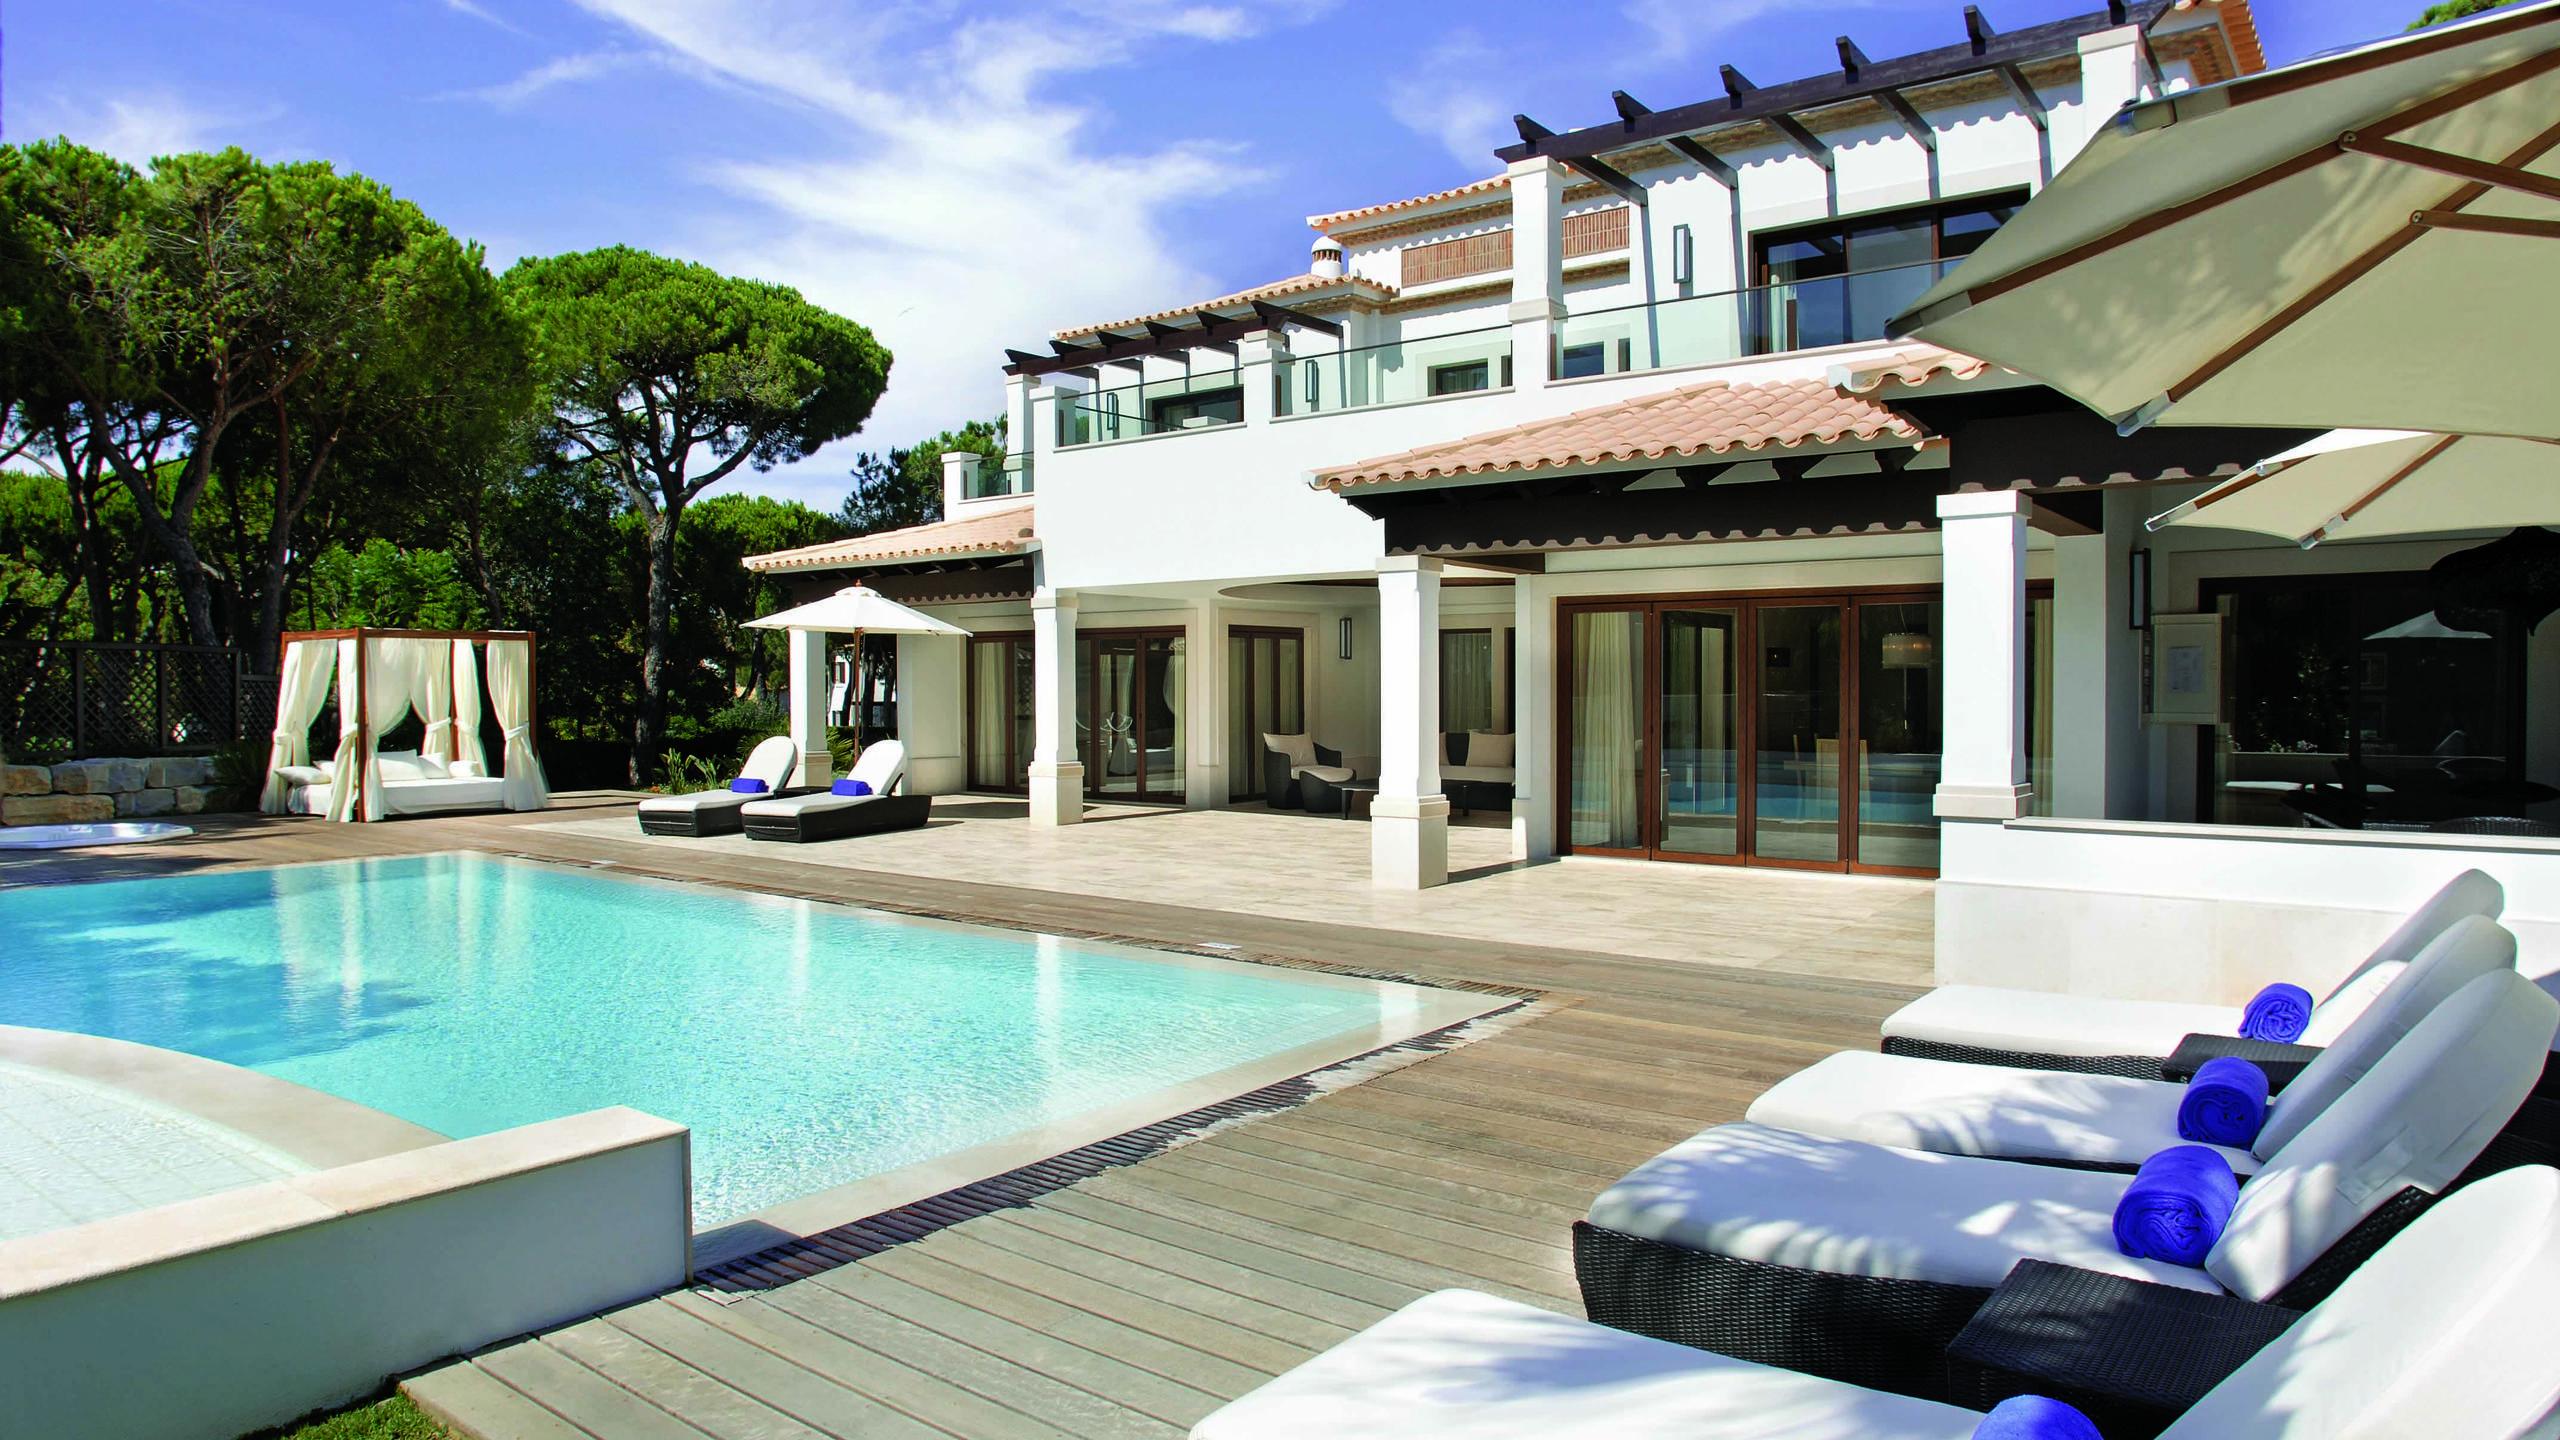 Villa S Interior Design 12: Deluxe Villas